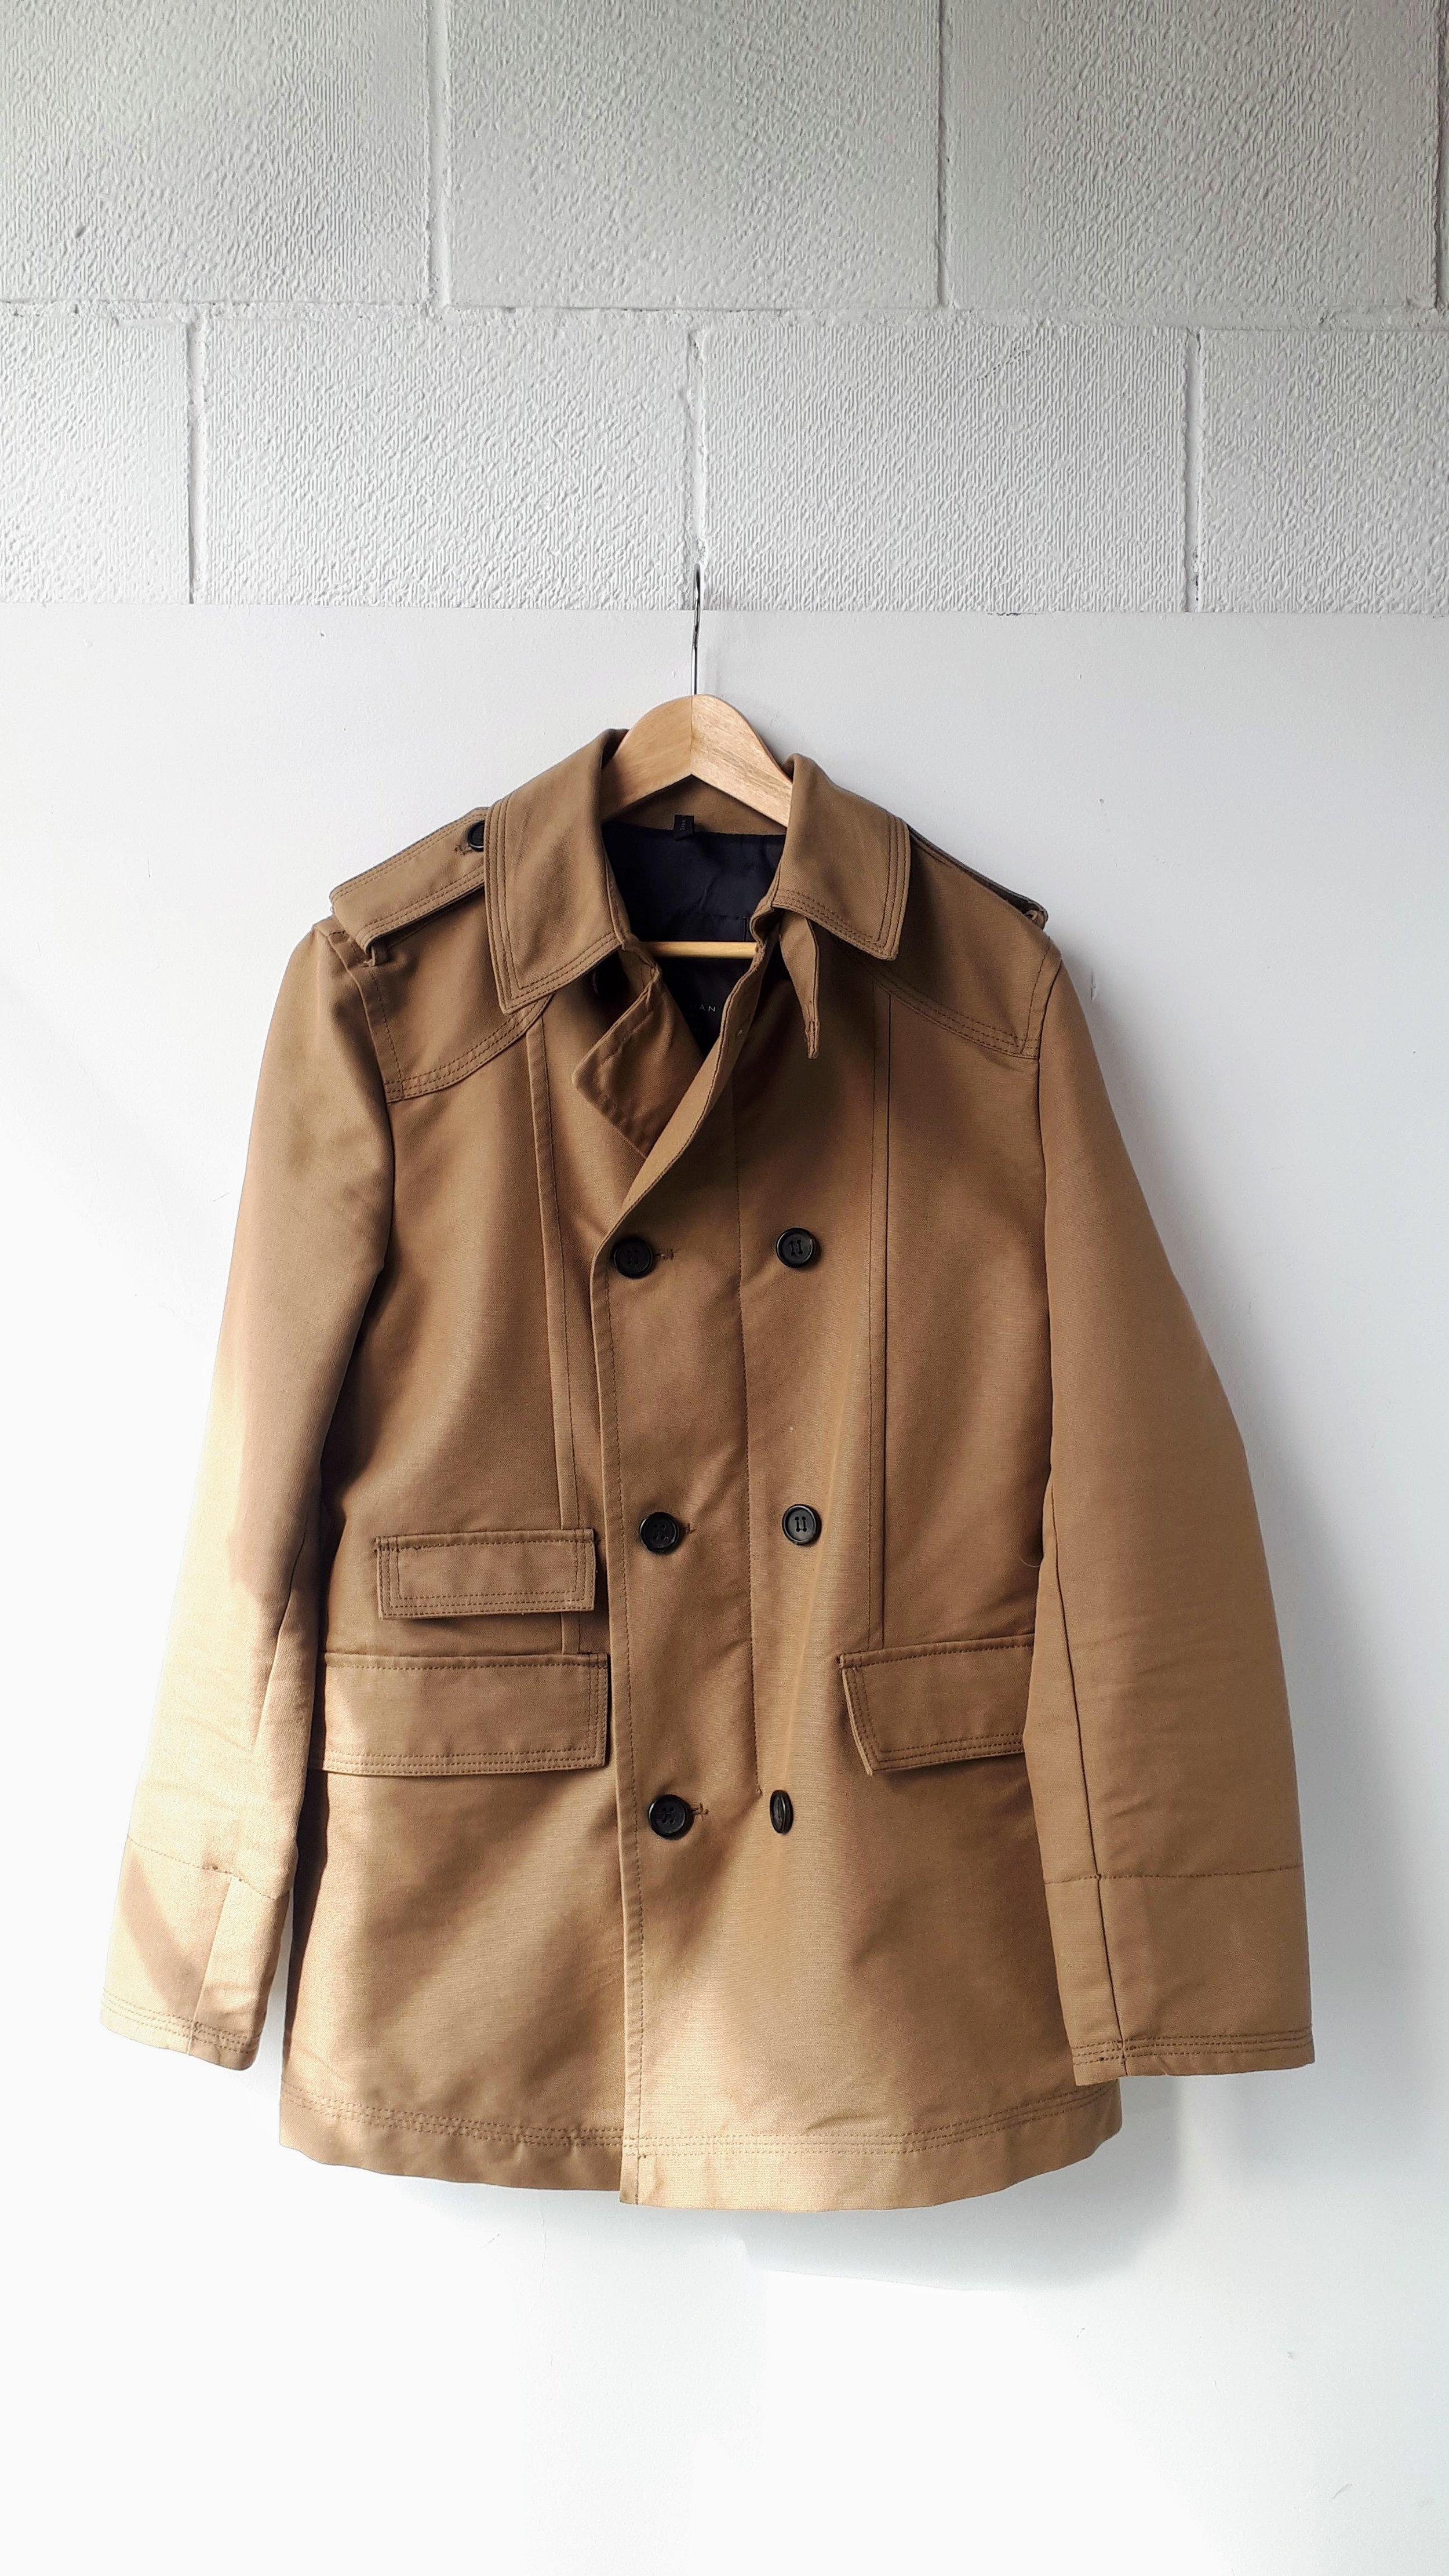 Coat; Men's size M, $56